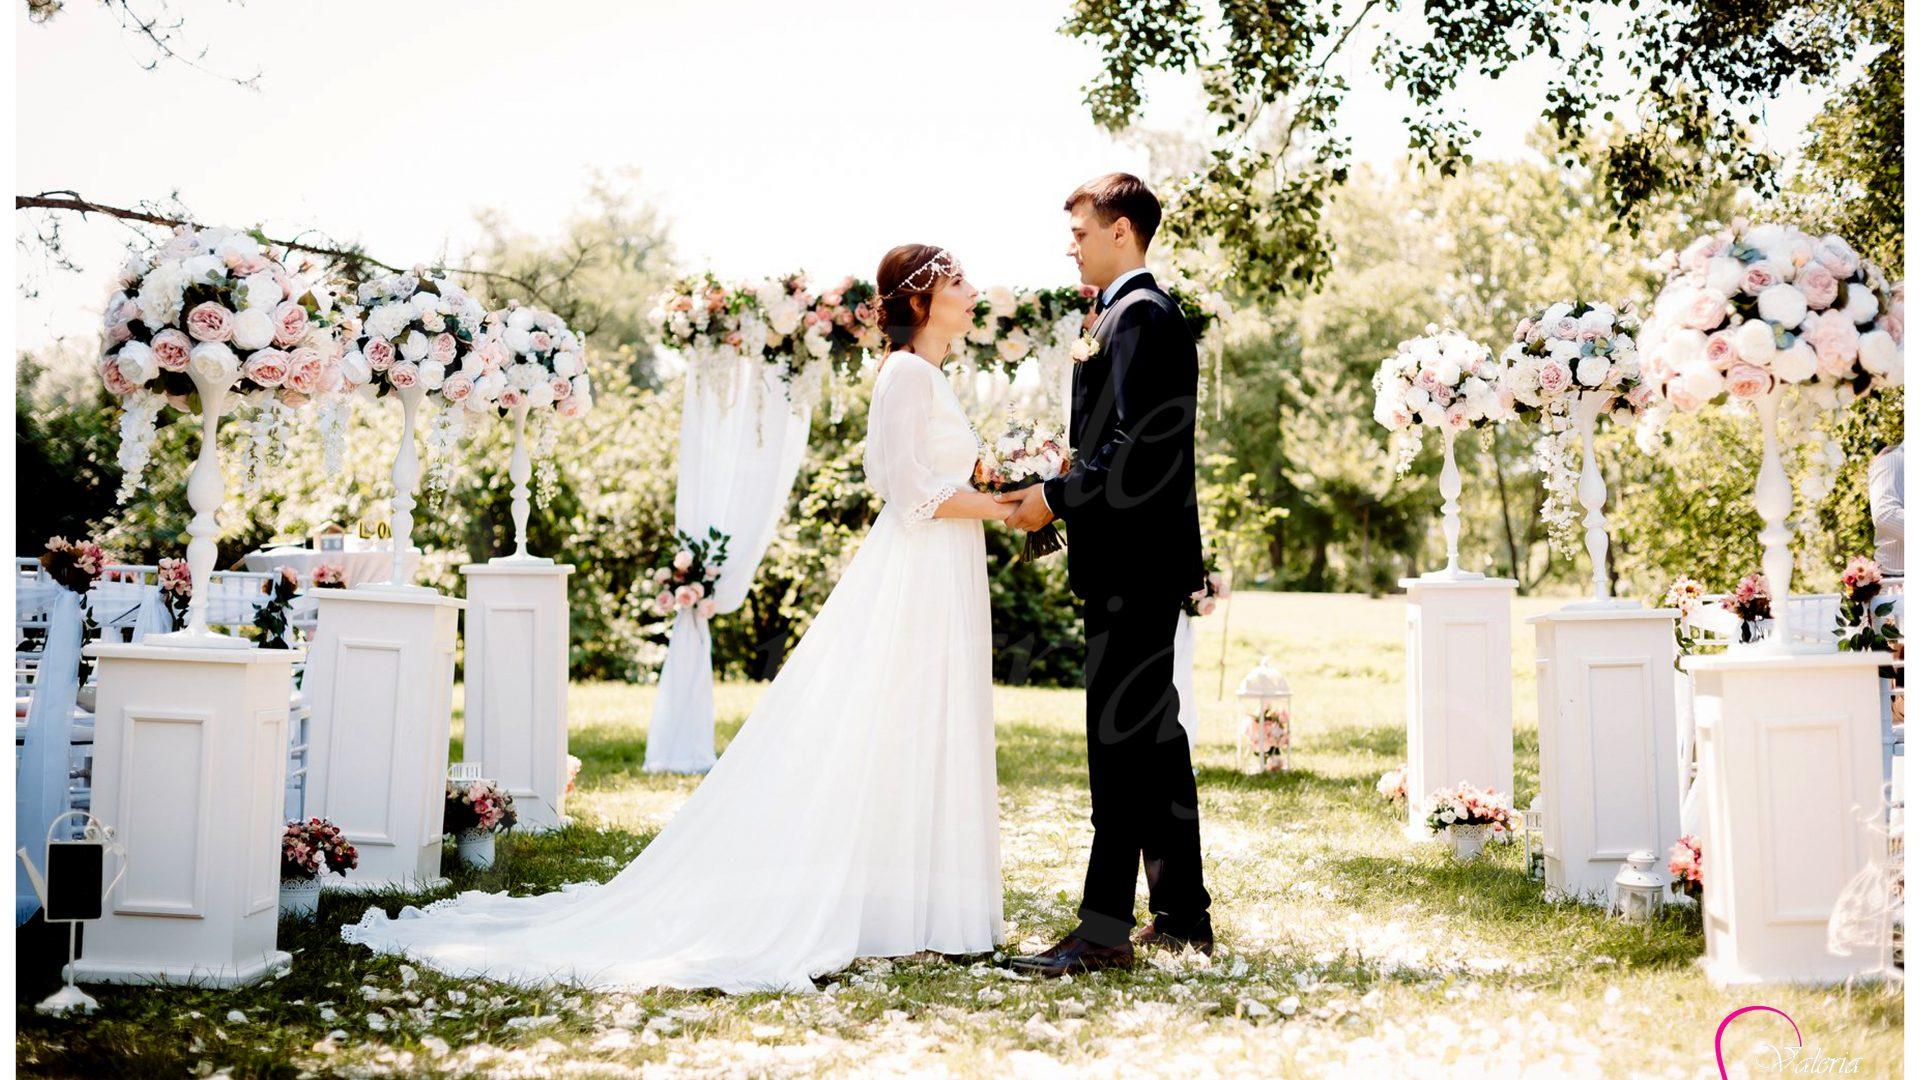 Inregistrarea casatoriei sub cerul liber Agentia Valeria Mariage 069787665 www.valeria (18)